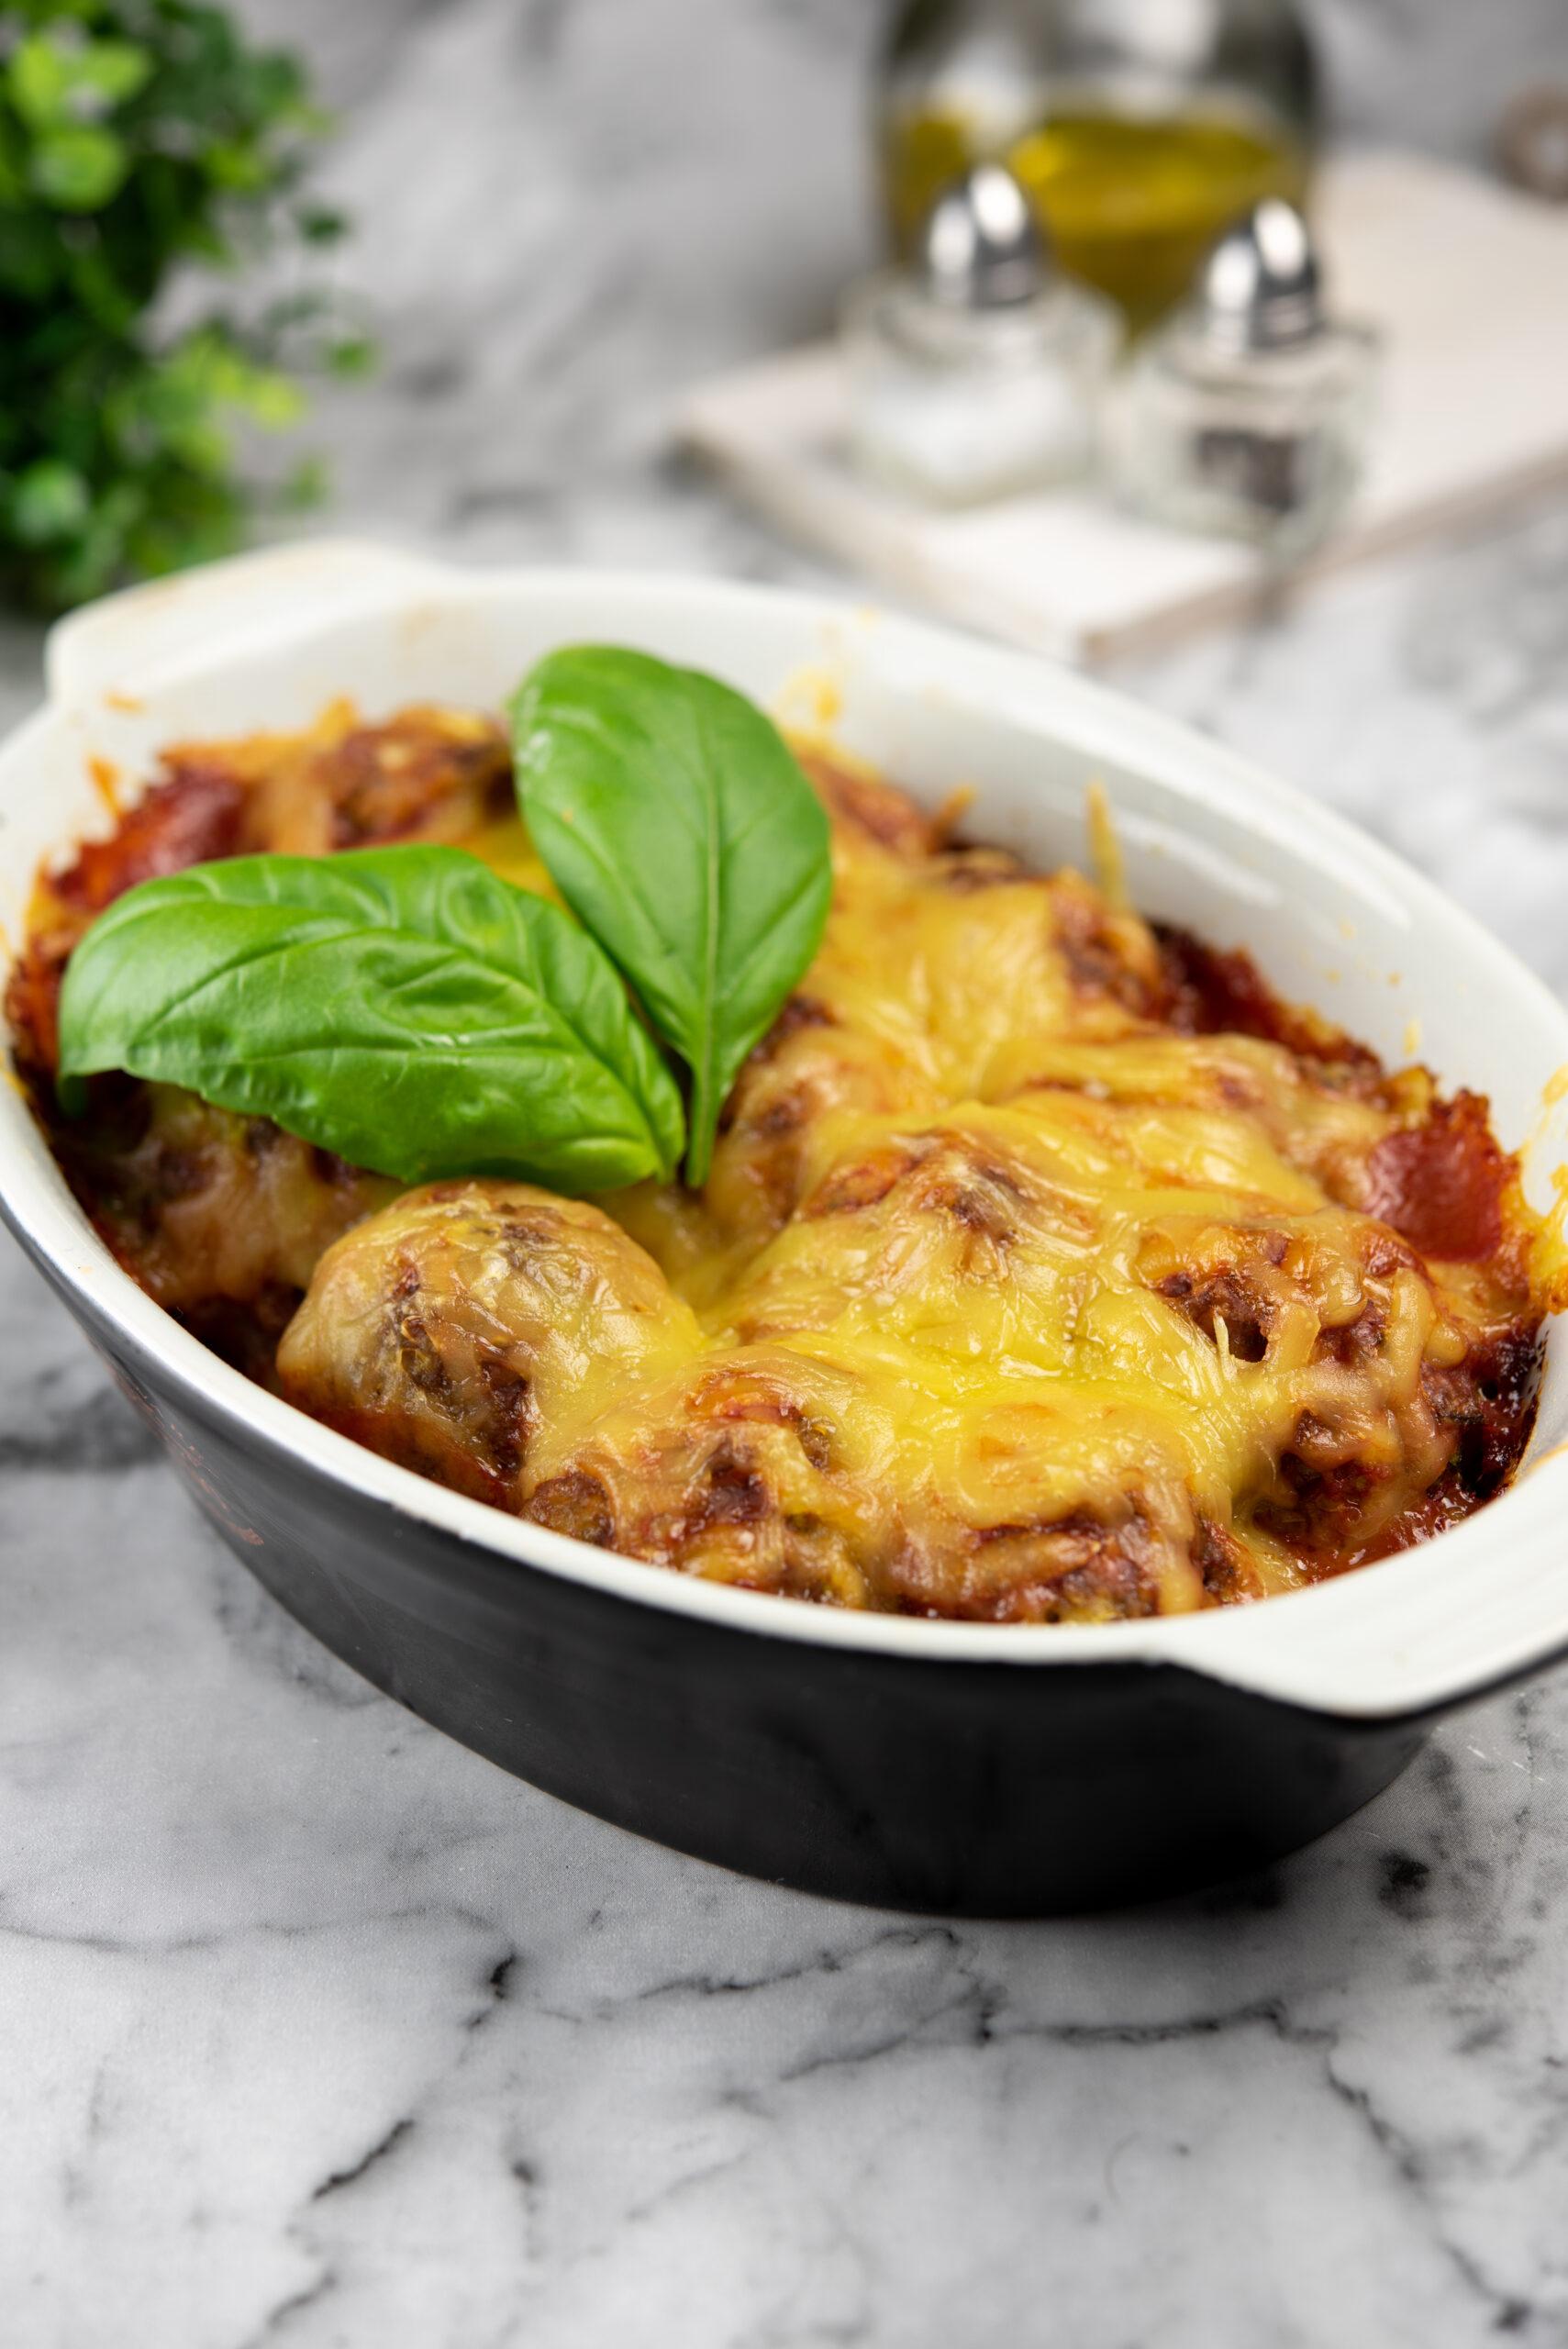 baked meatball casserole